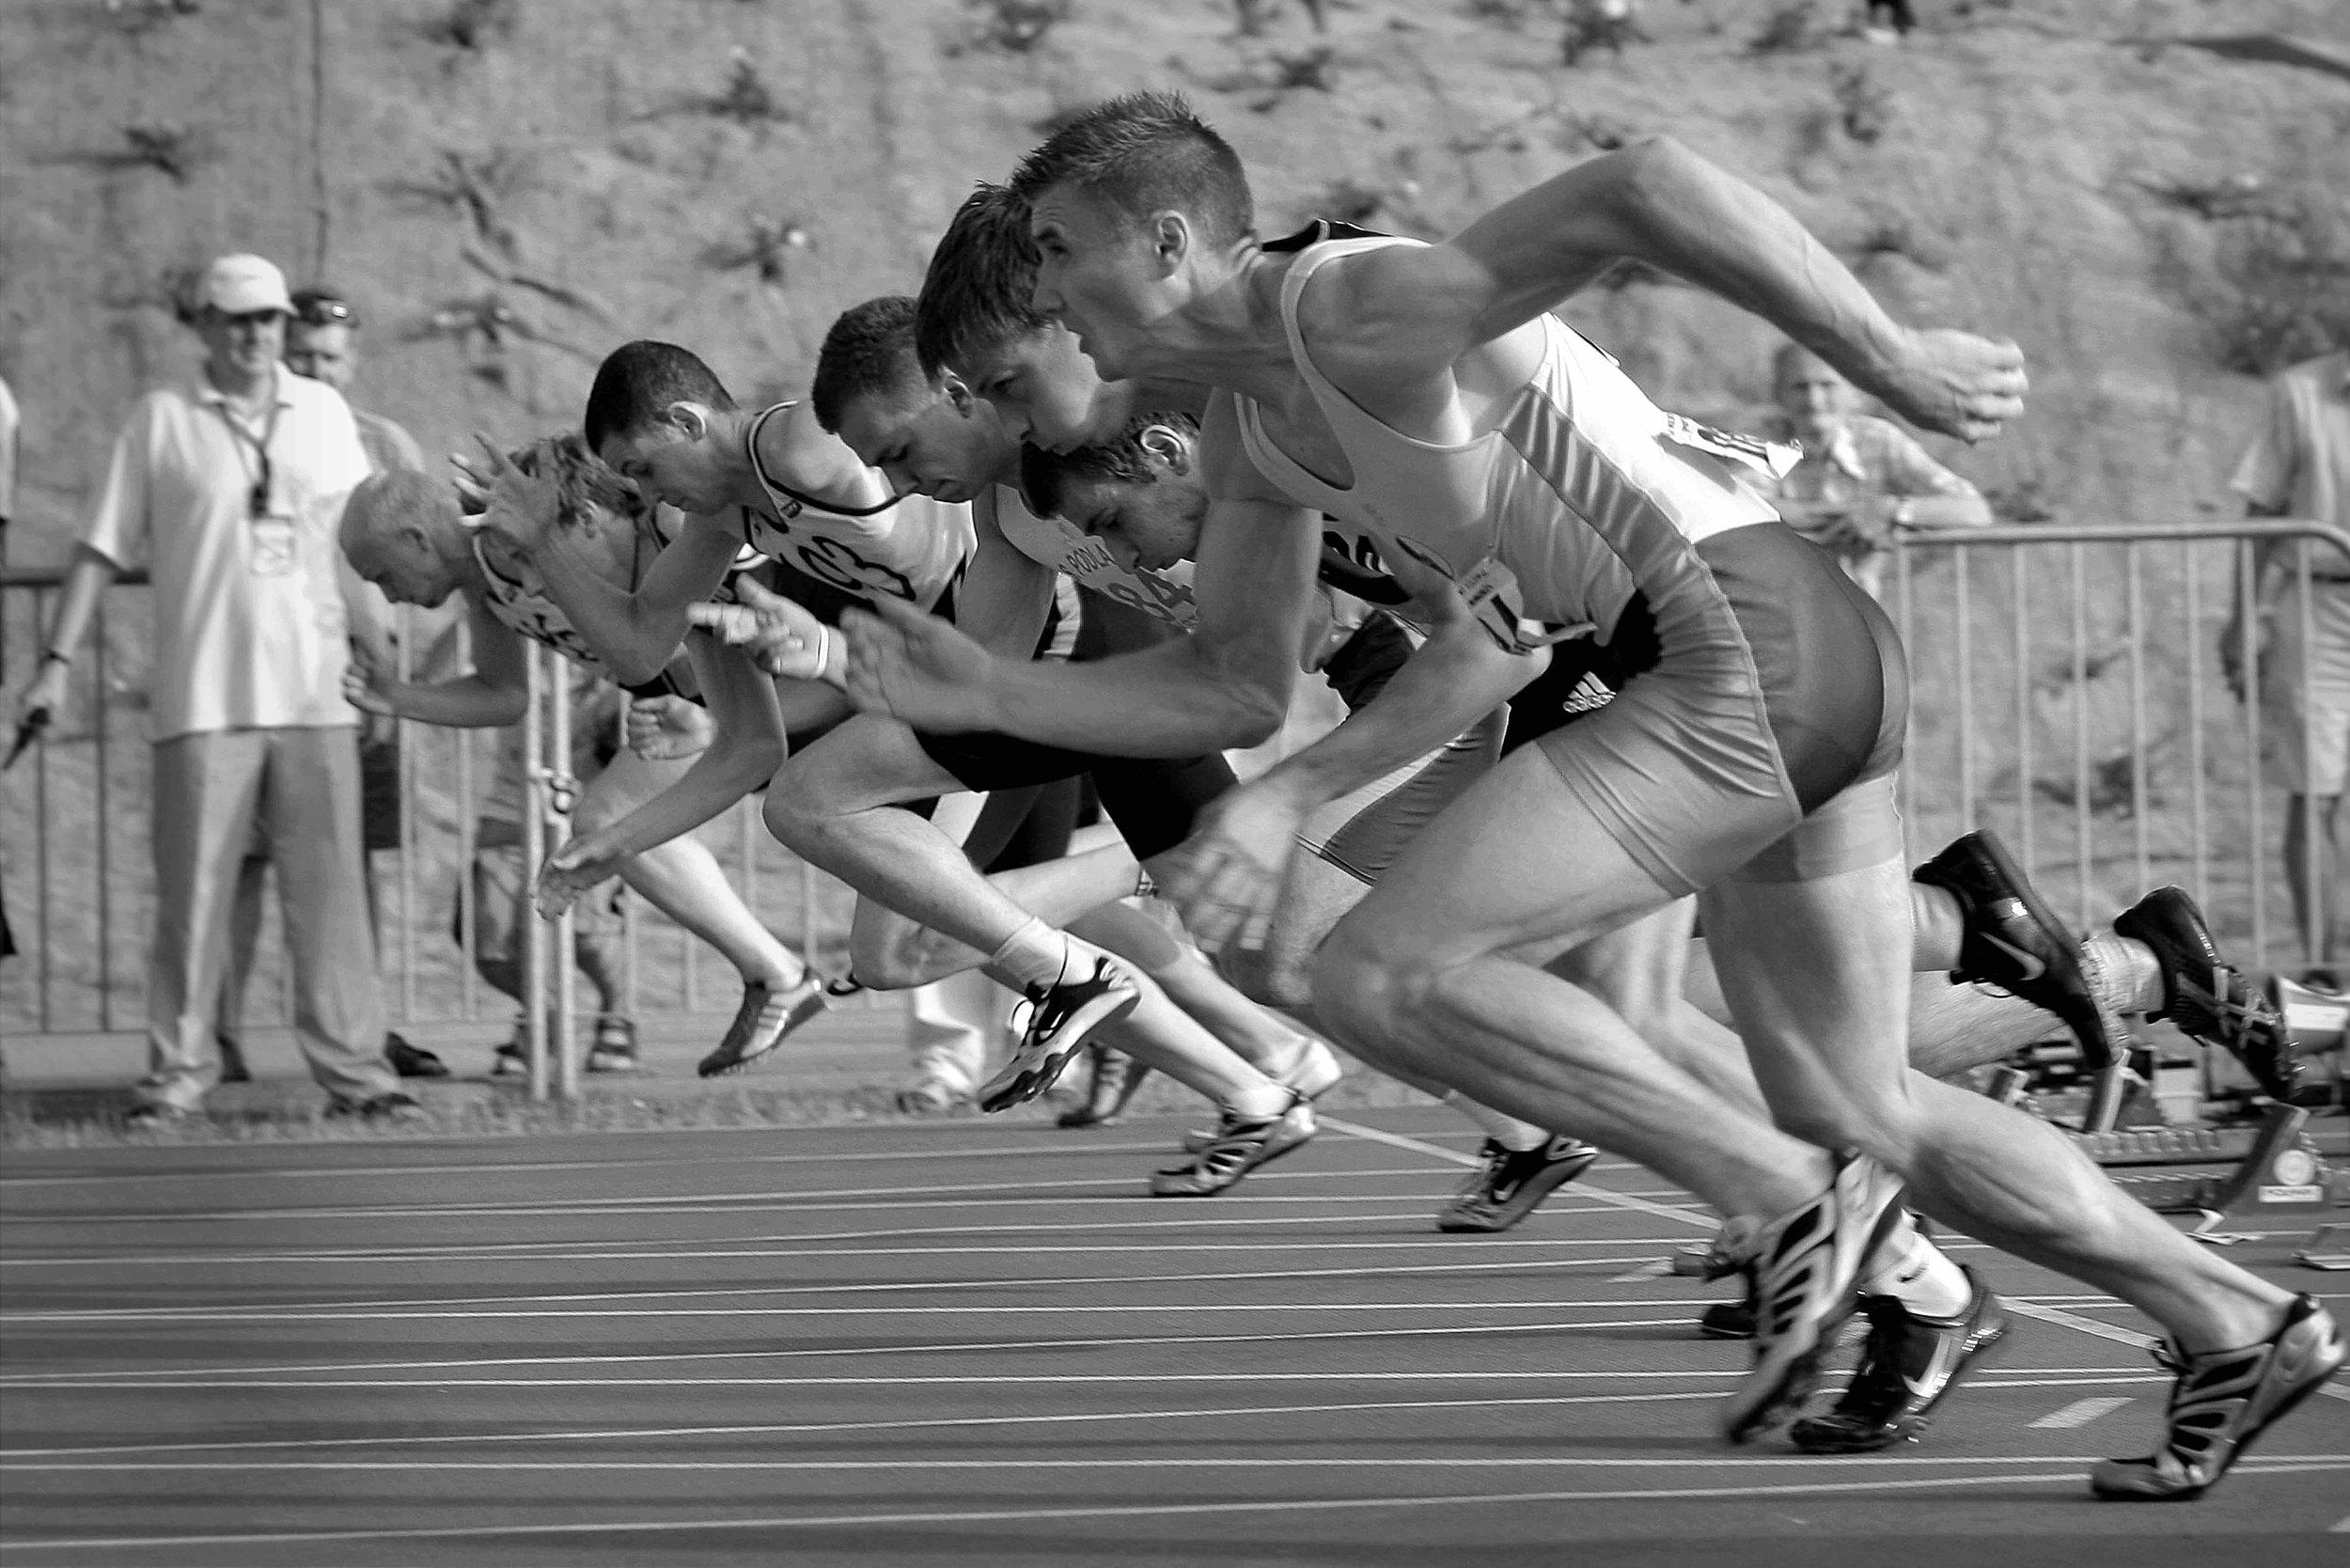 athletes-black-and-white-black-and-white-34514.jpg